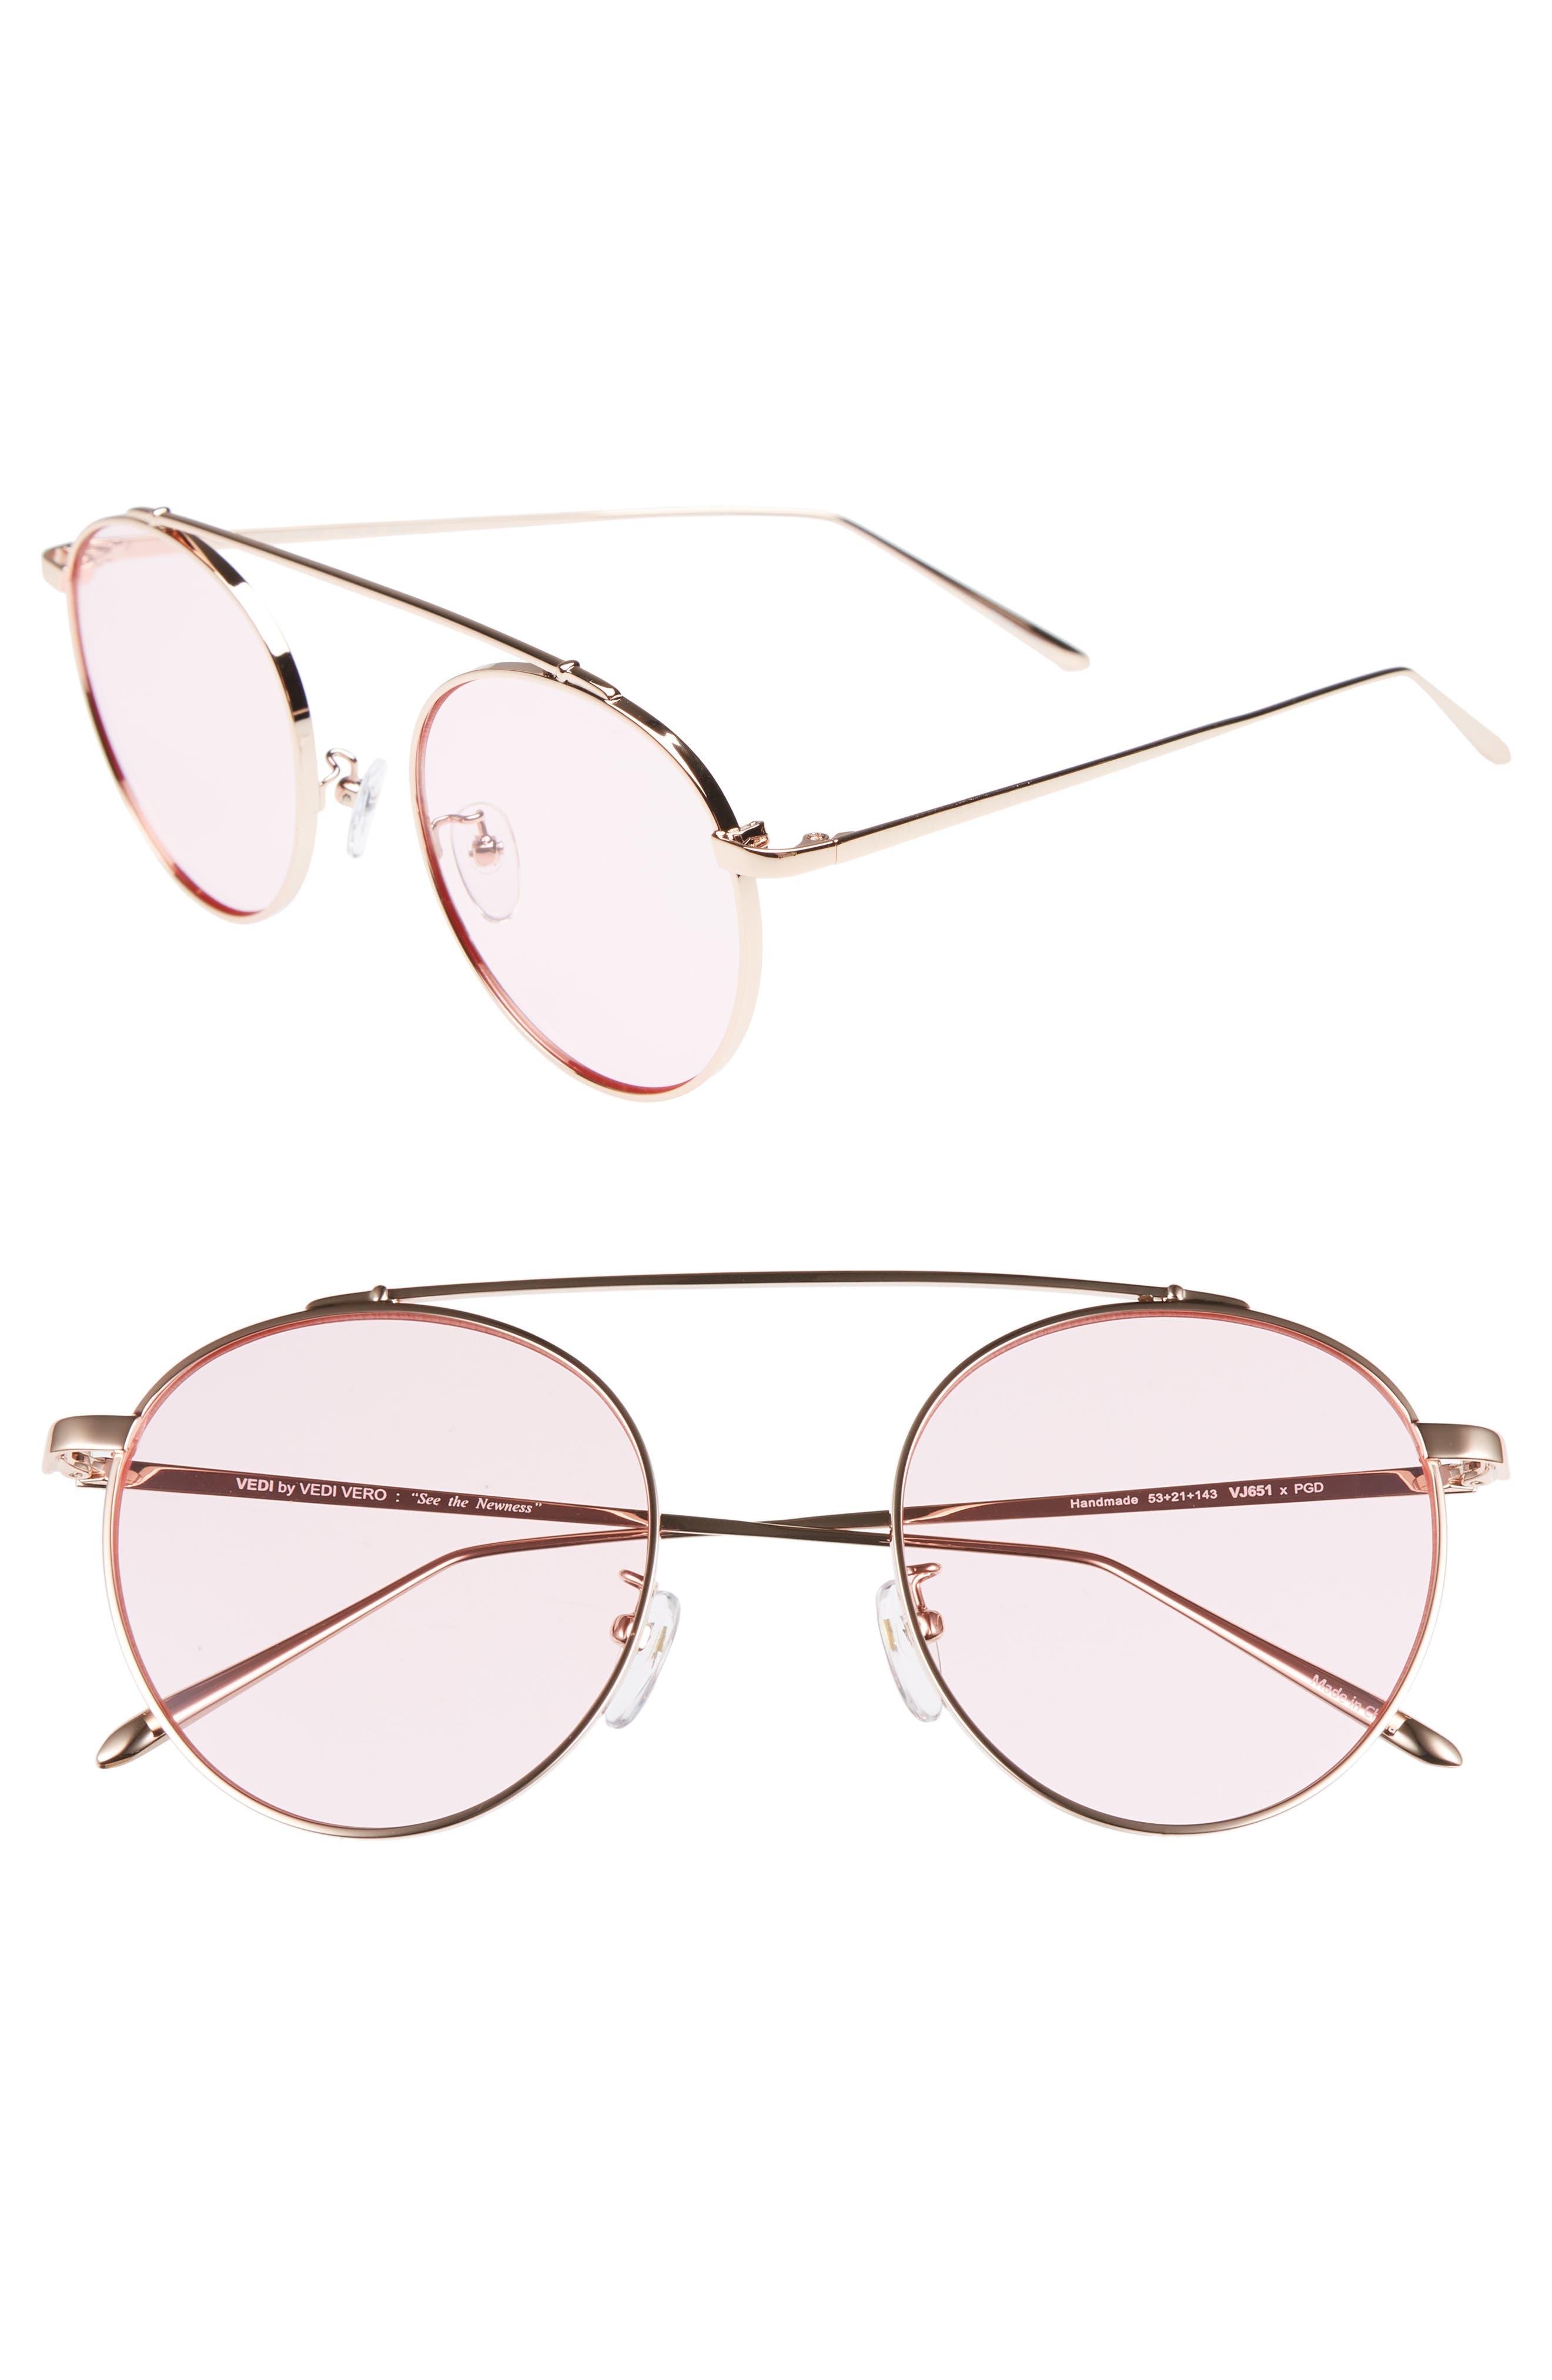 53mm Round Sunglasses,                         Main,                         color, Rosegld/Pink